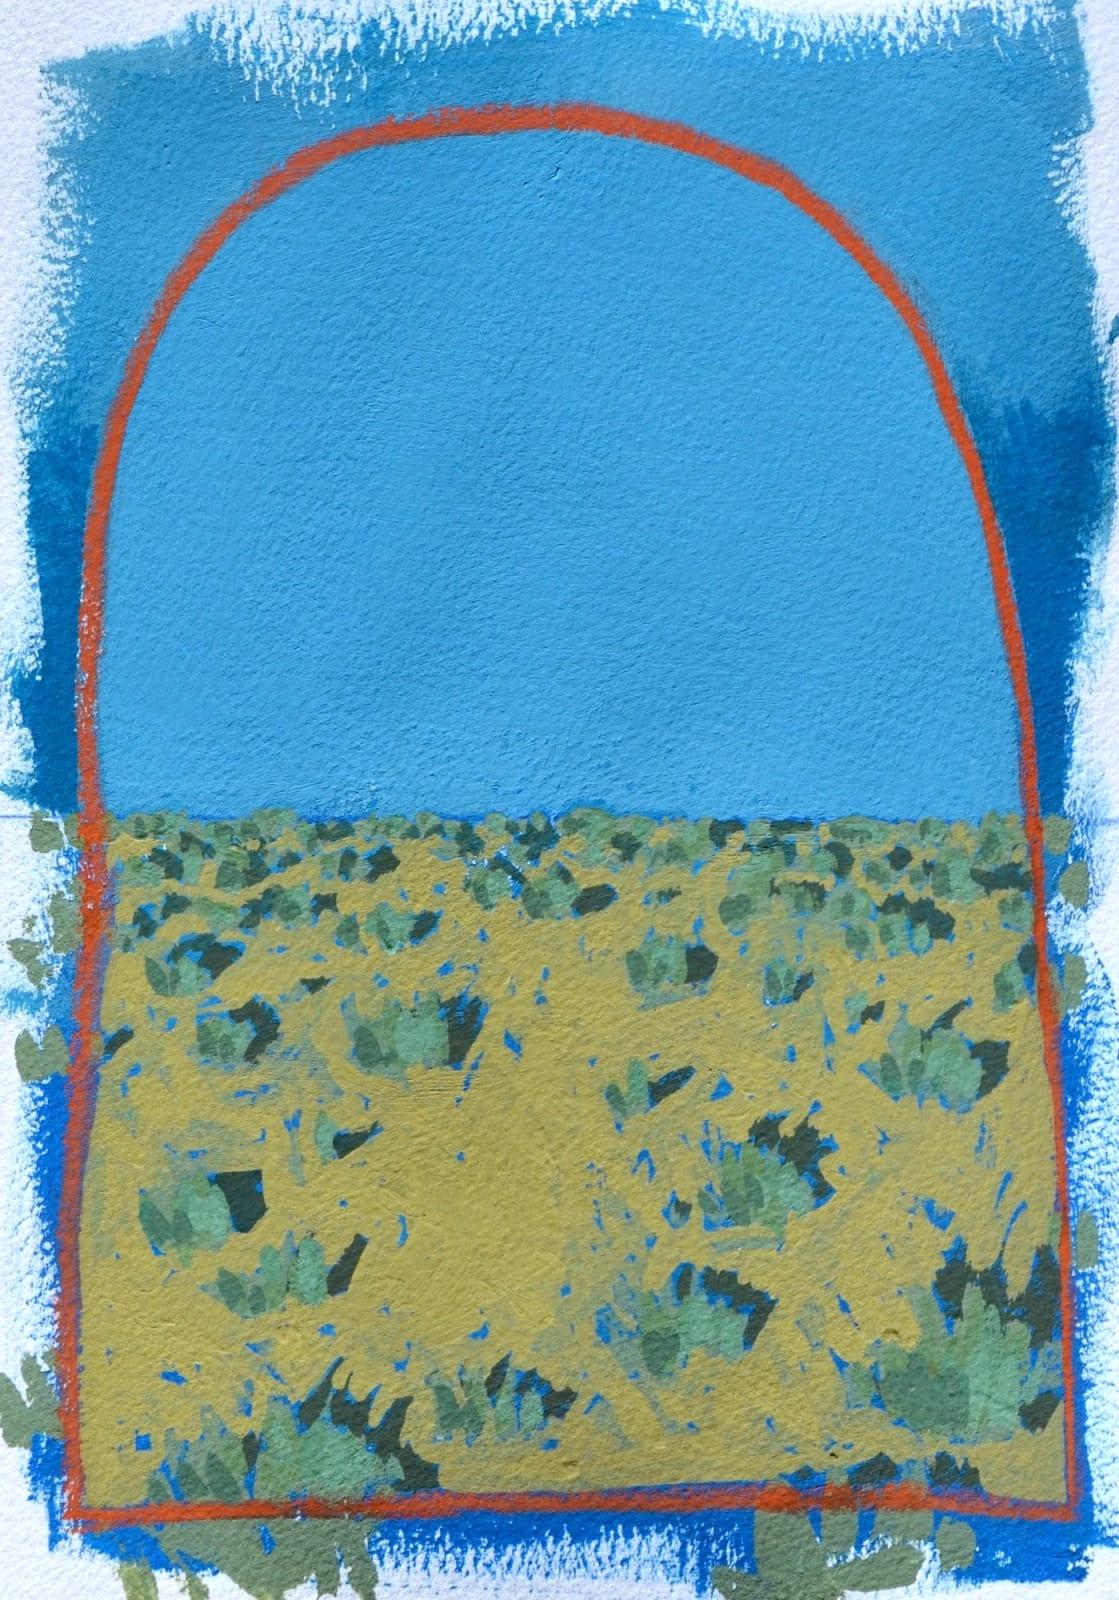 Layla Luna, Mini Desert Painting #06 (Completely), 2018